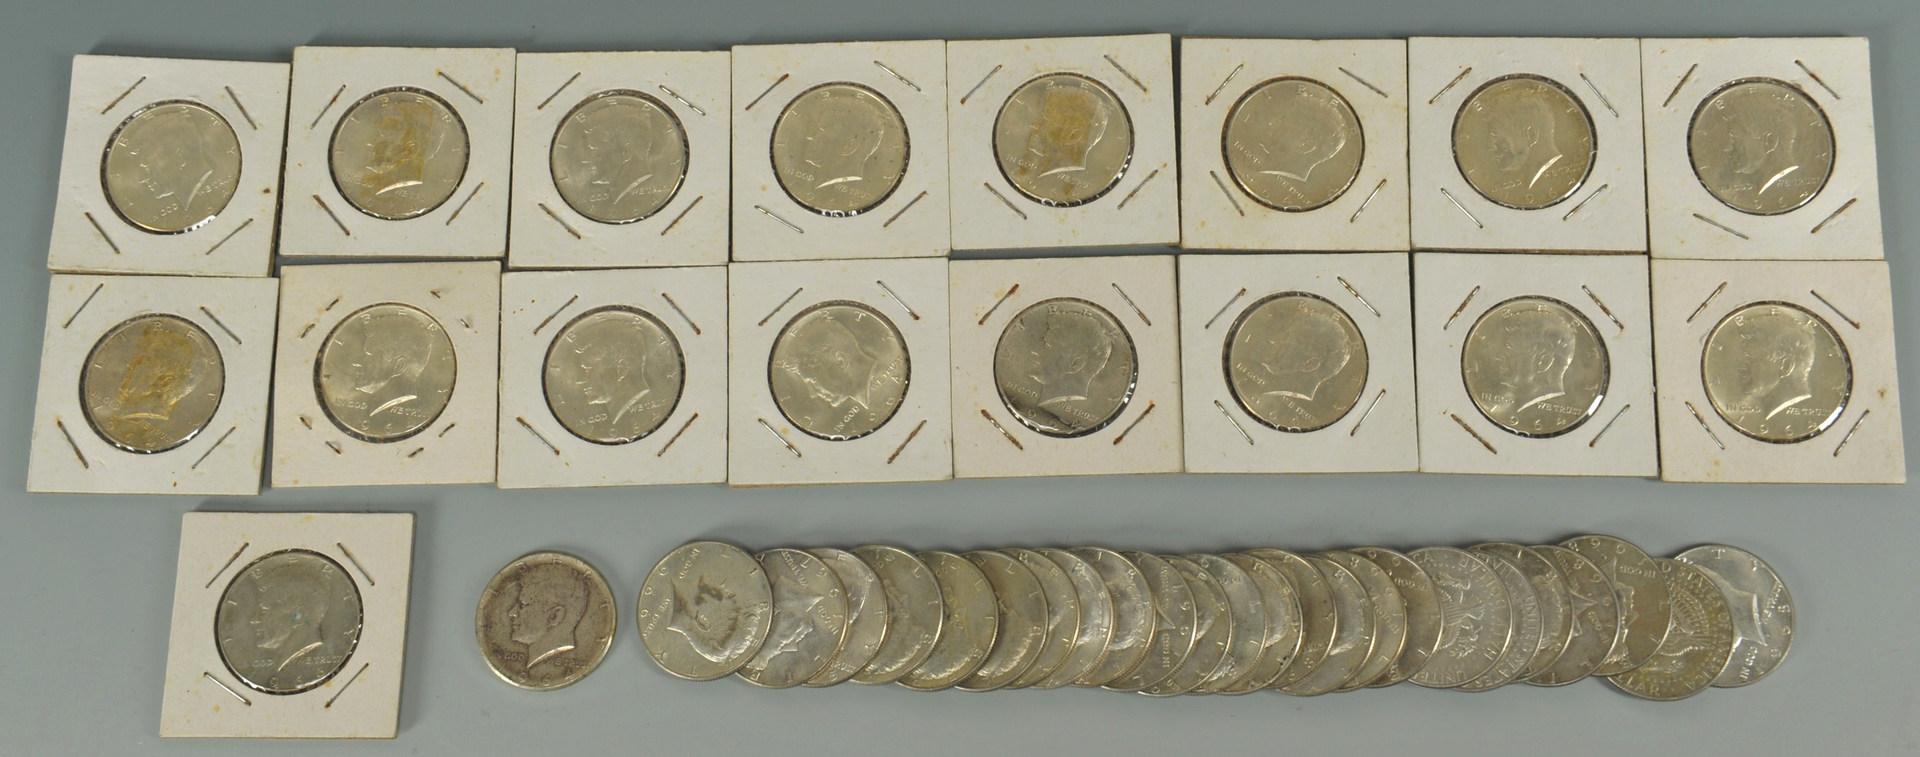 Lot 550: Grouping of U. S. Kennedy Half Dollars